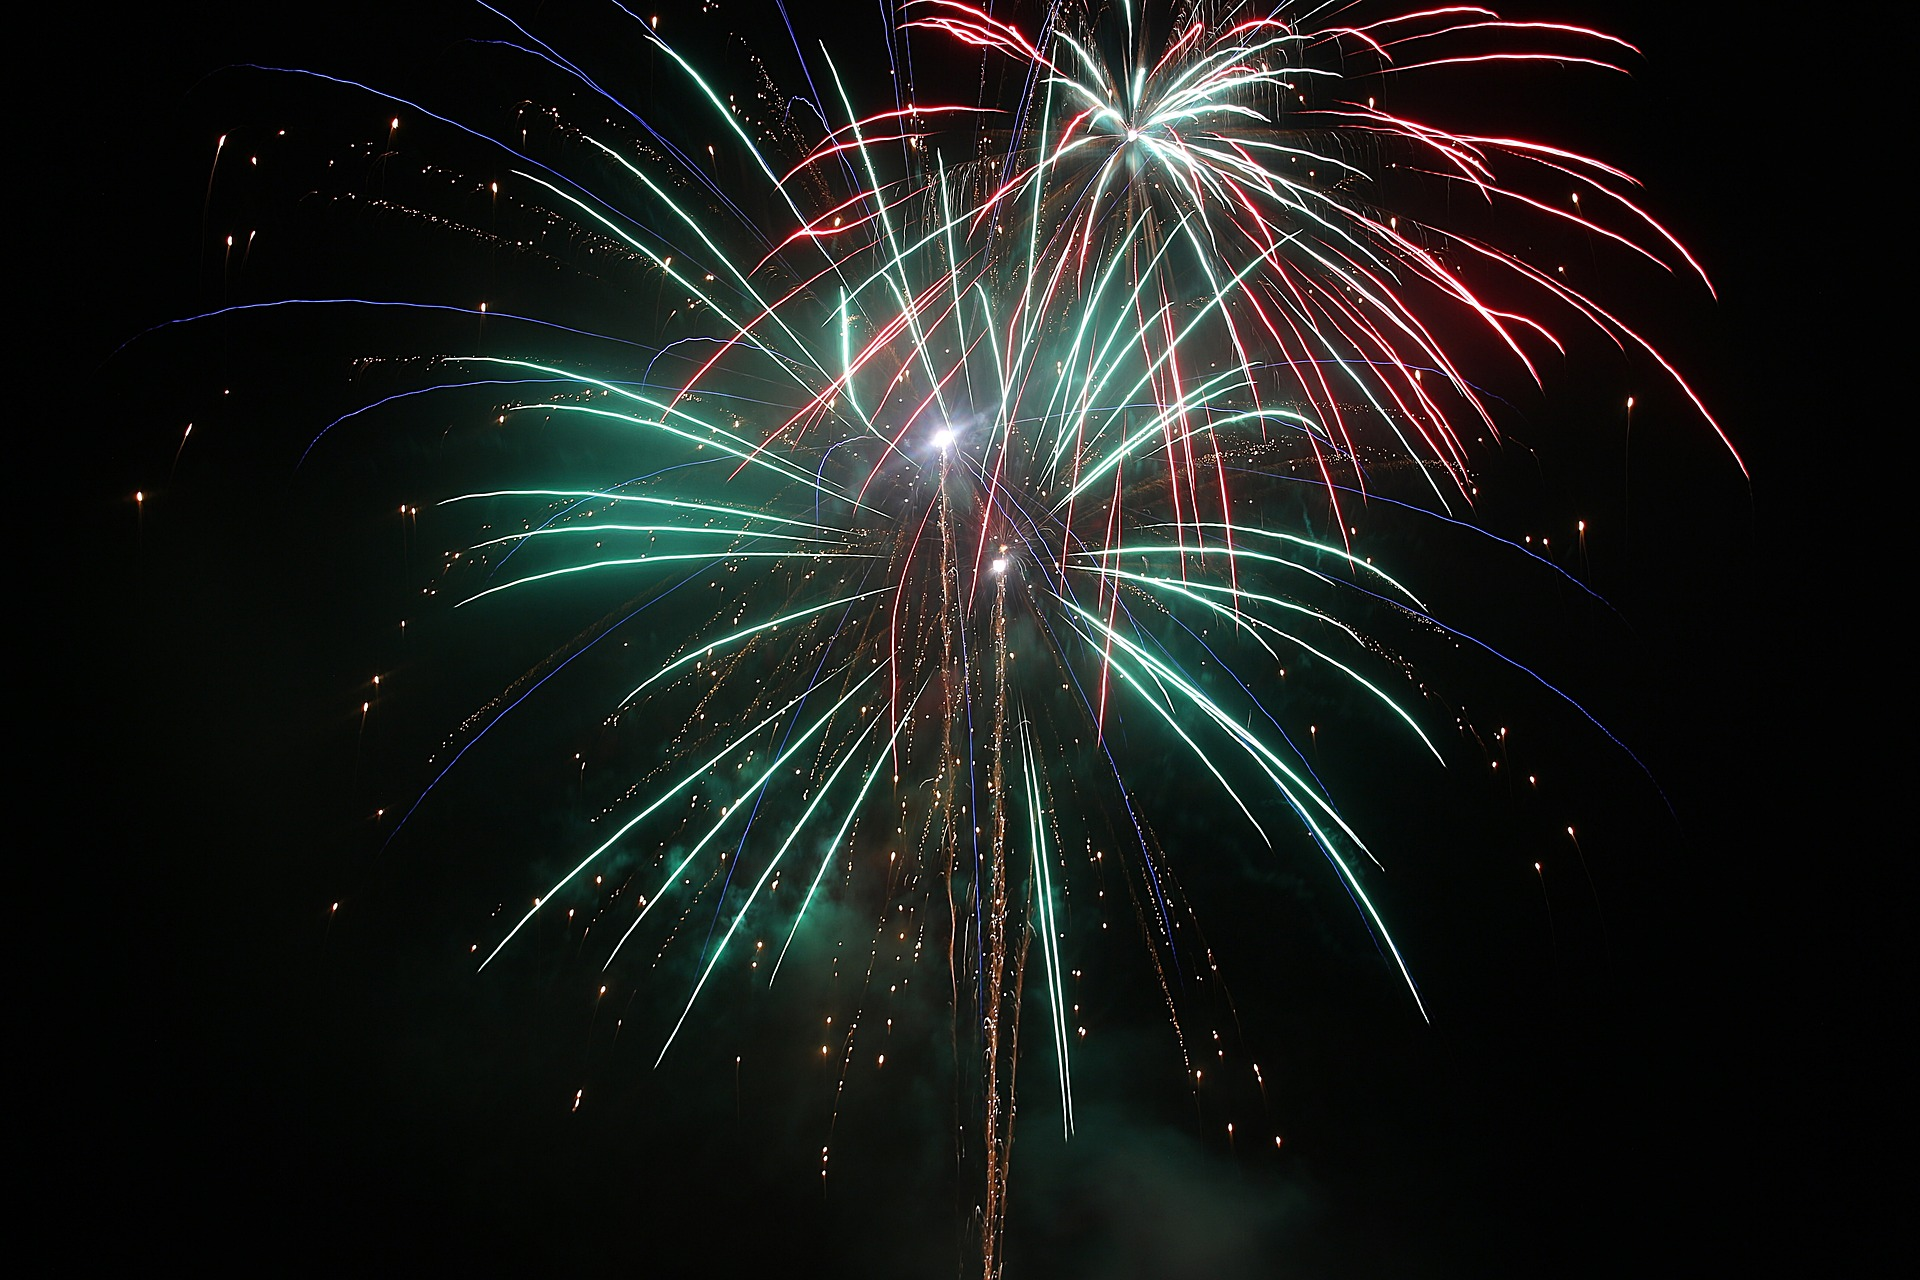 Fireworks, Bonfire, Celebrate, Celebration, Colorful, HQ Photo